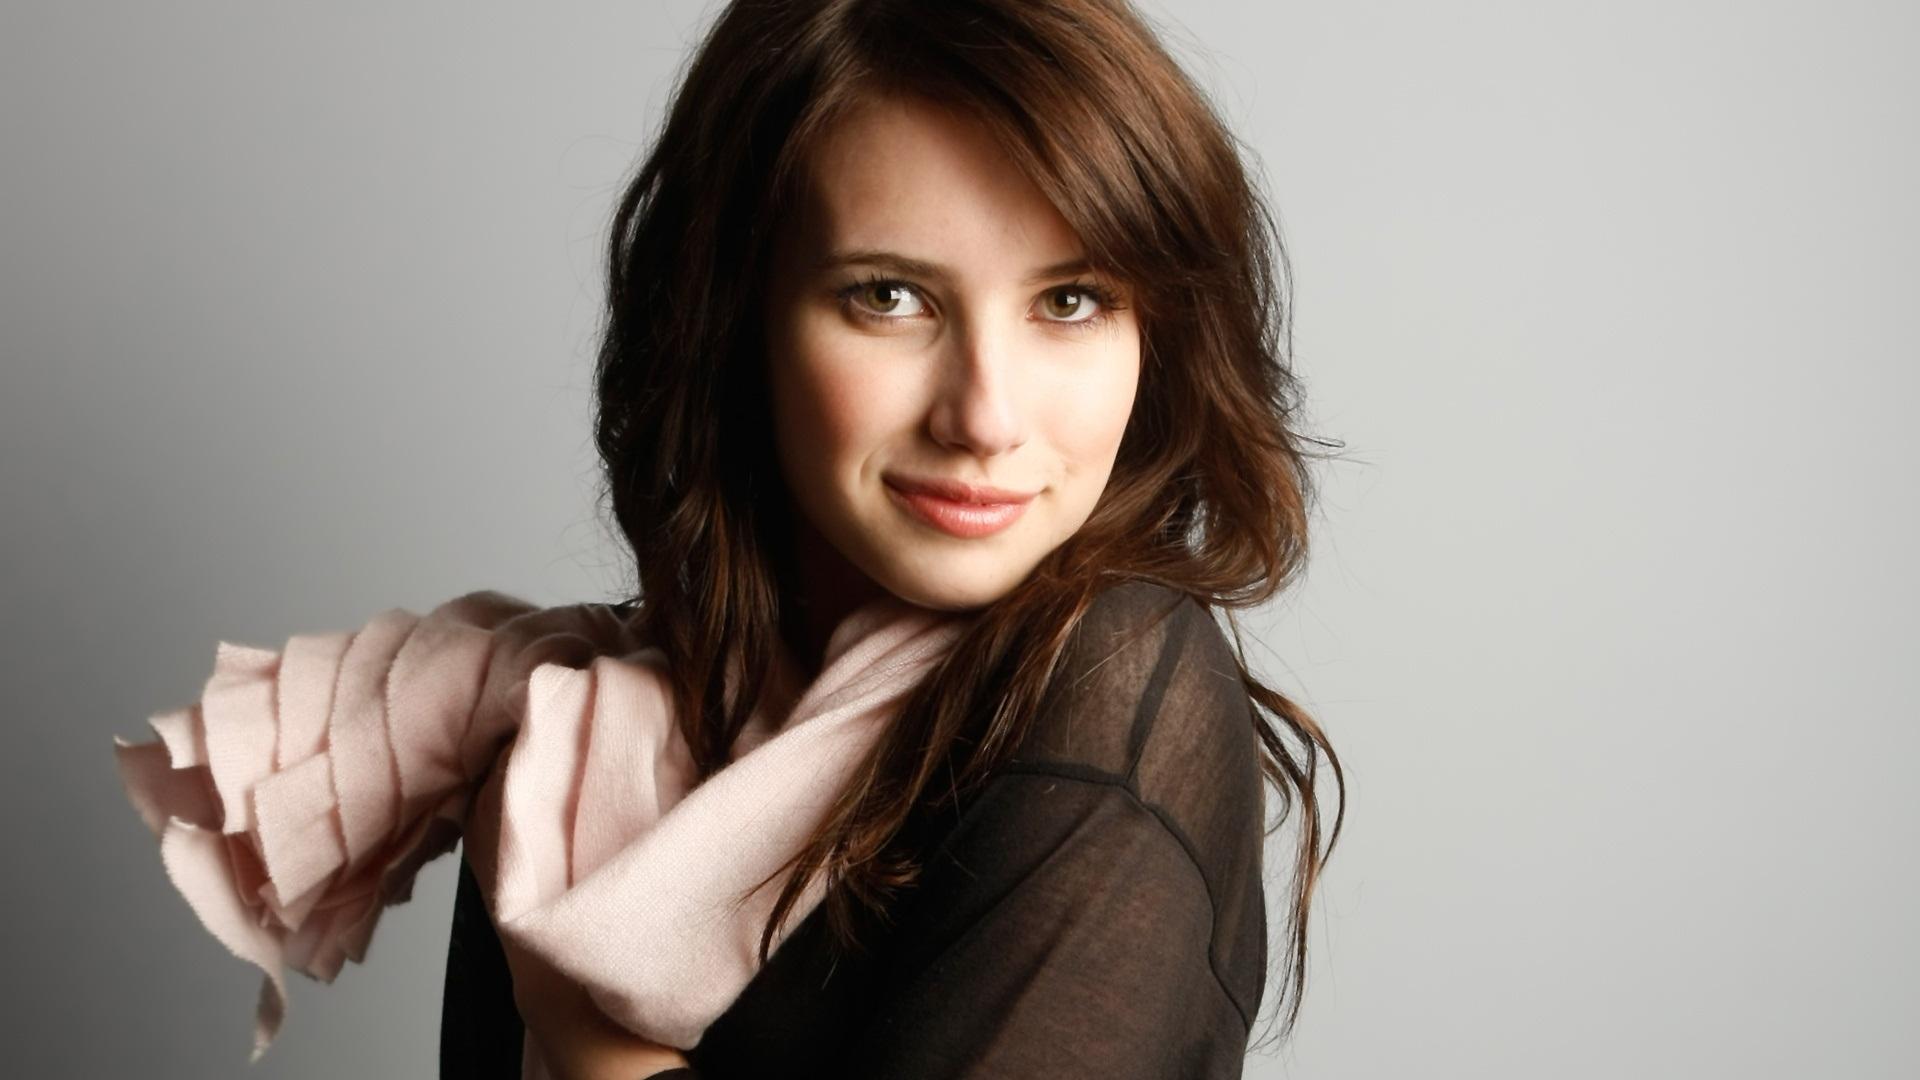 Emma Roberts Hd For Desktop Background 13 HD Wallpapers